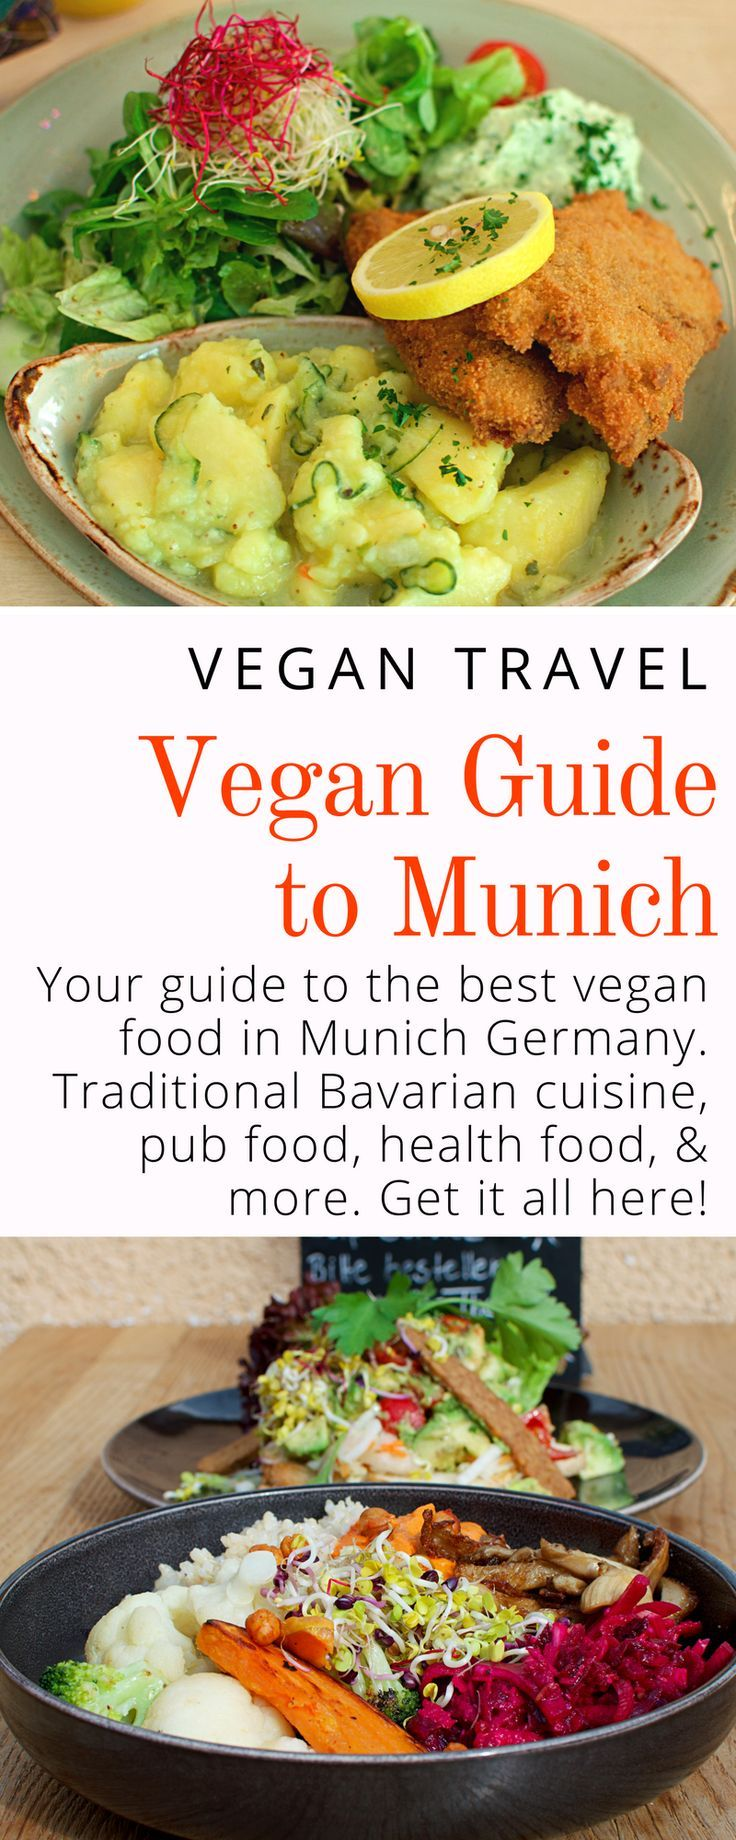 Vegan Munich Guide Best Vegan Food In Munich Germany Veggie Visa Vegan Guide Vegan Recipes Pub Food